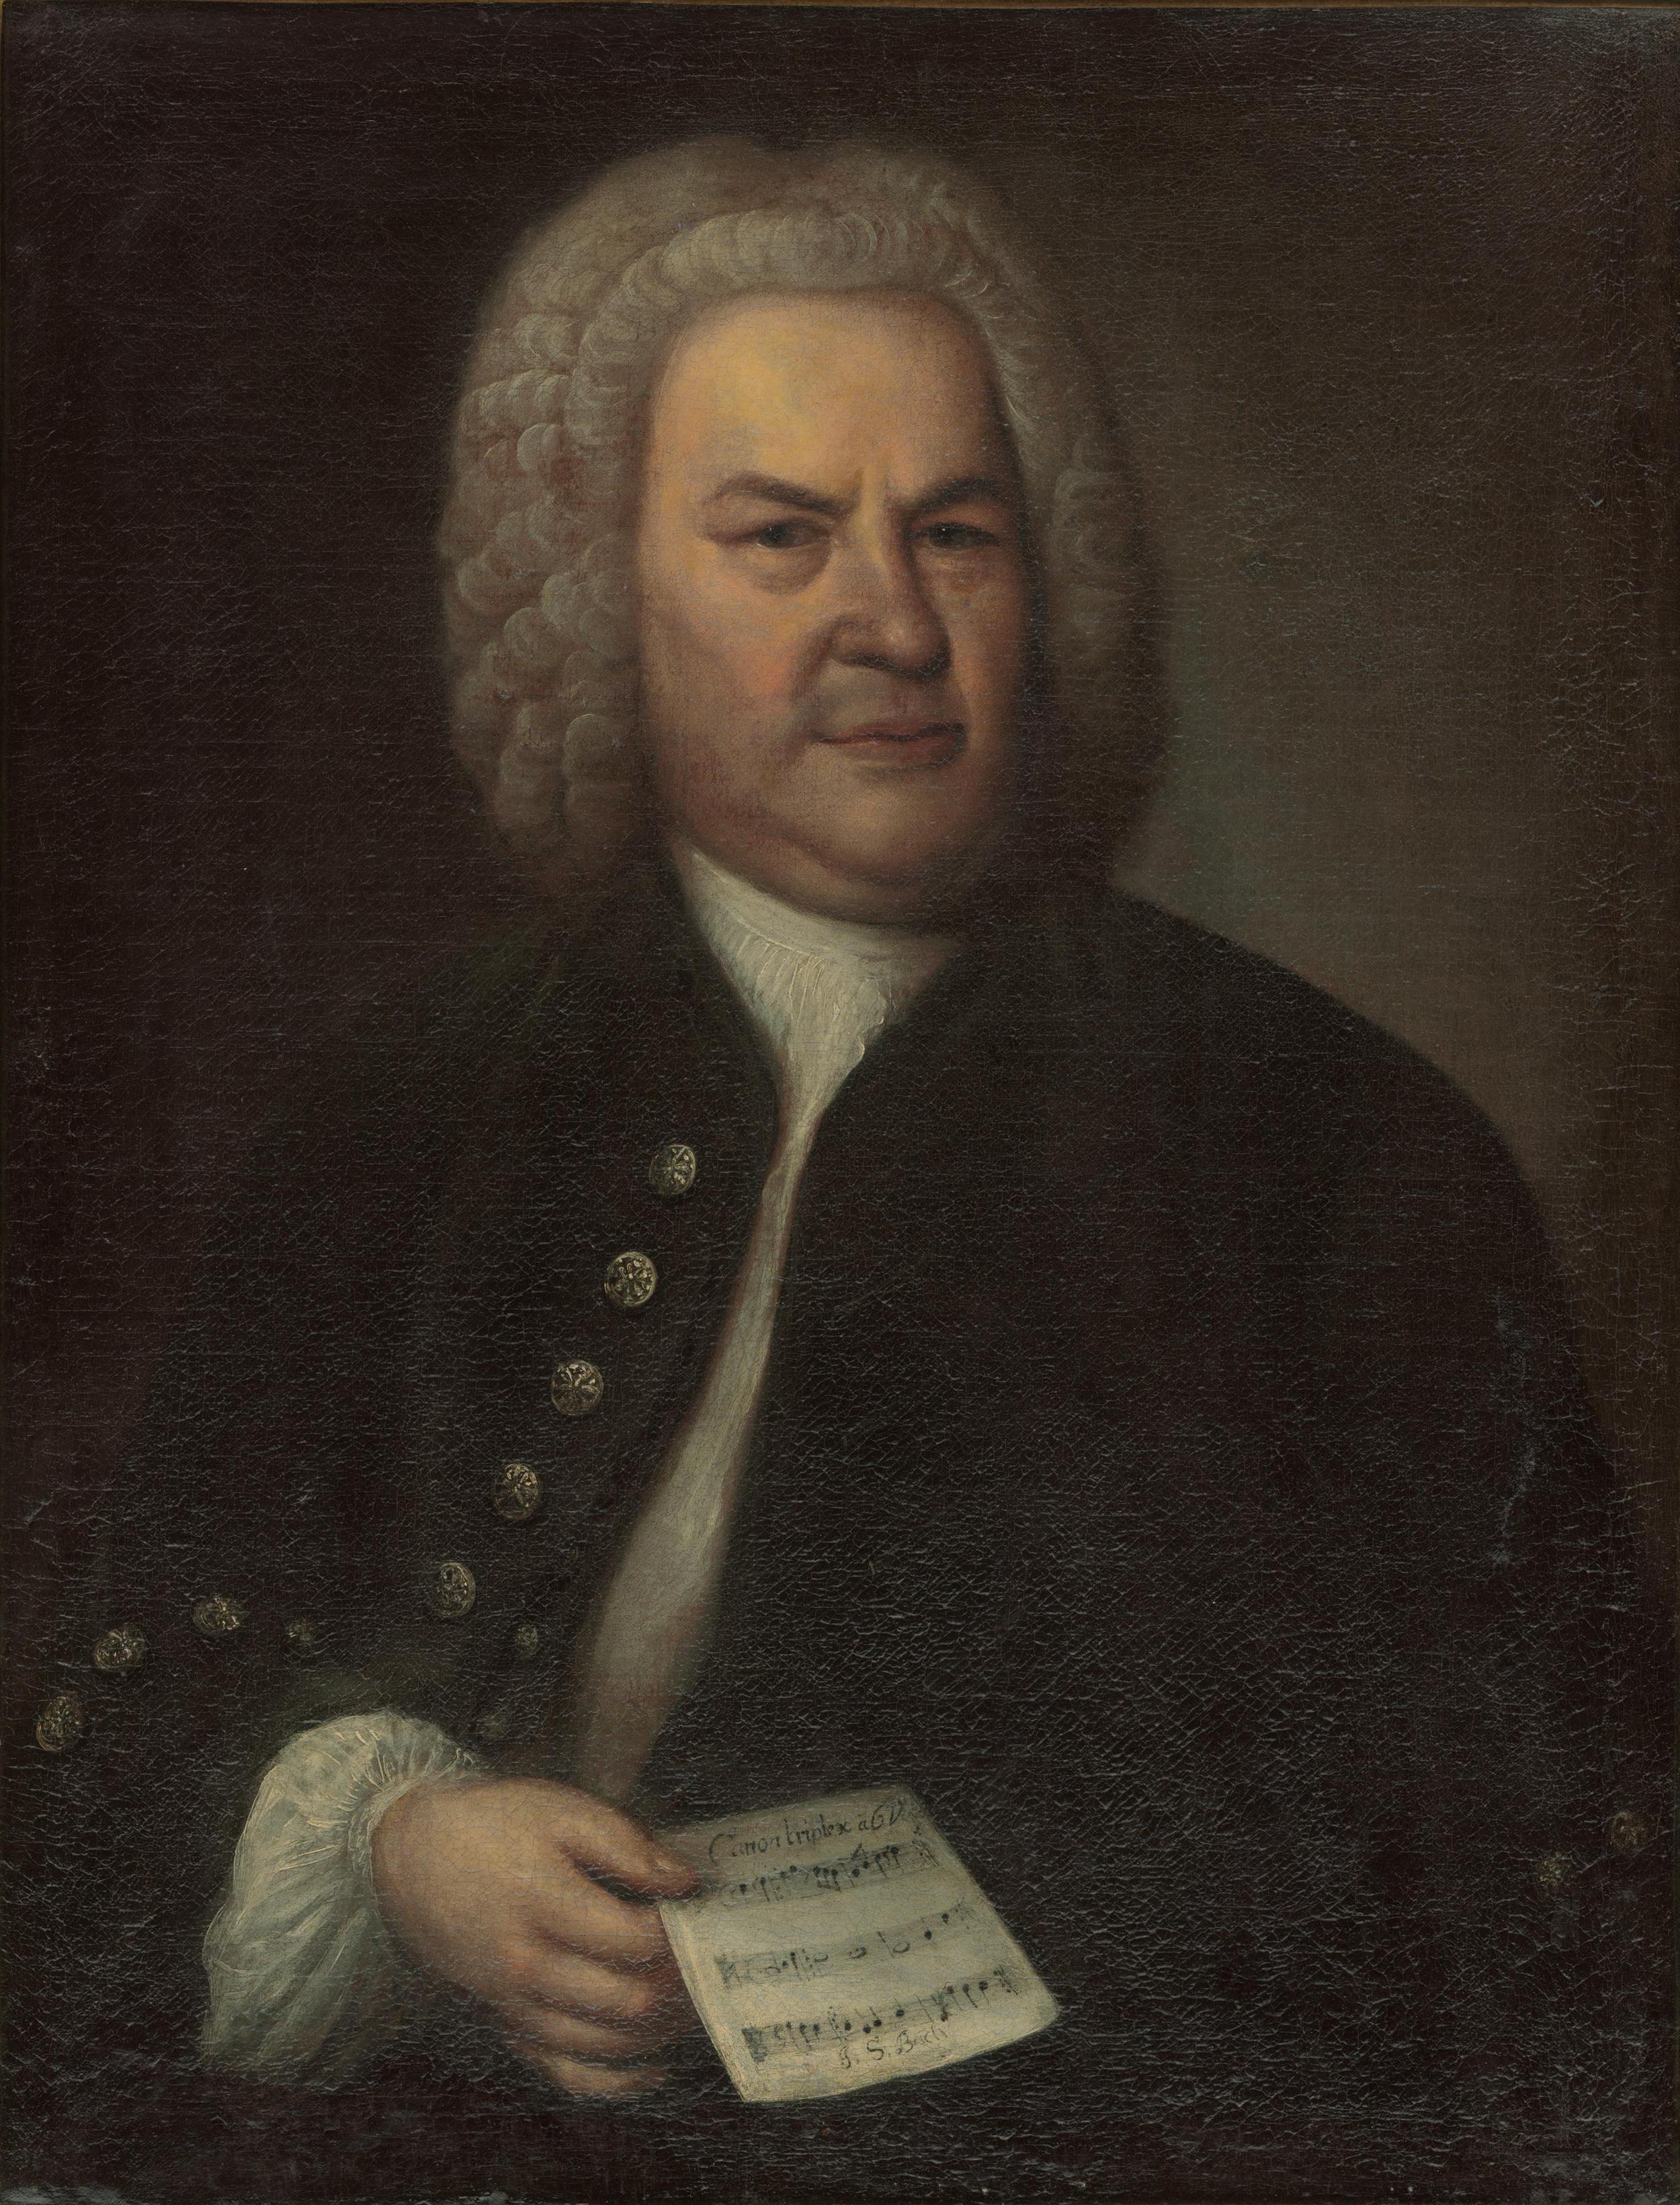 Elias Gottlob Haussmann, Portrait of J.S. Bach, 1746, Altes Rathaus Leipzig.